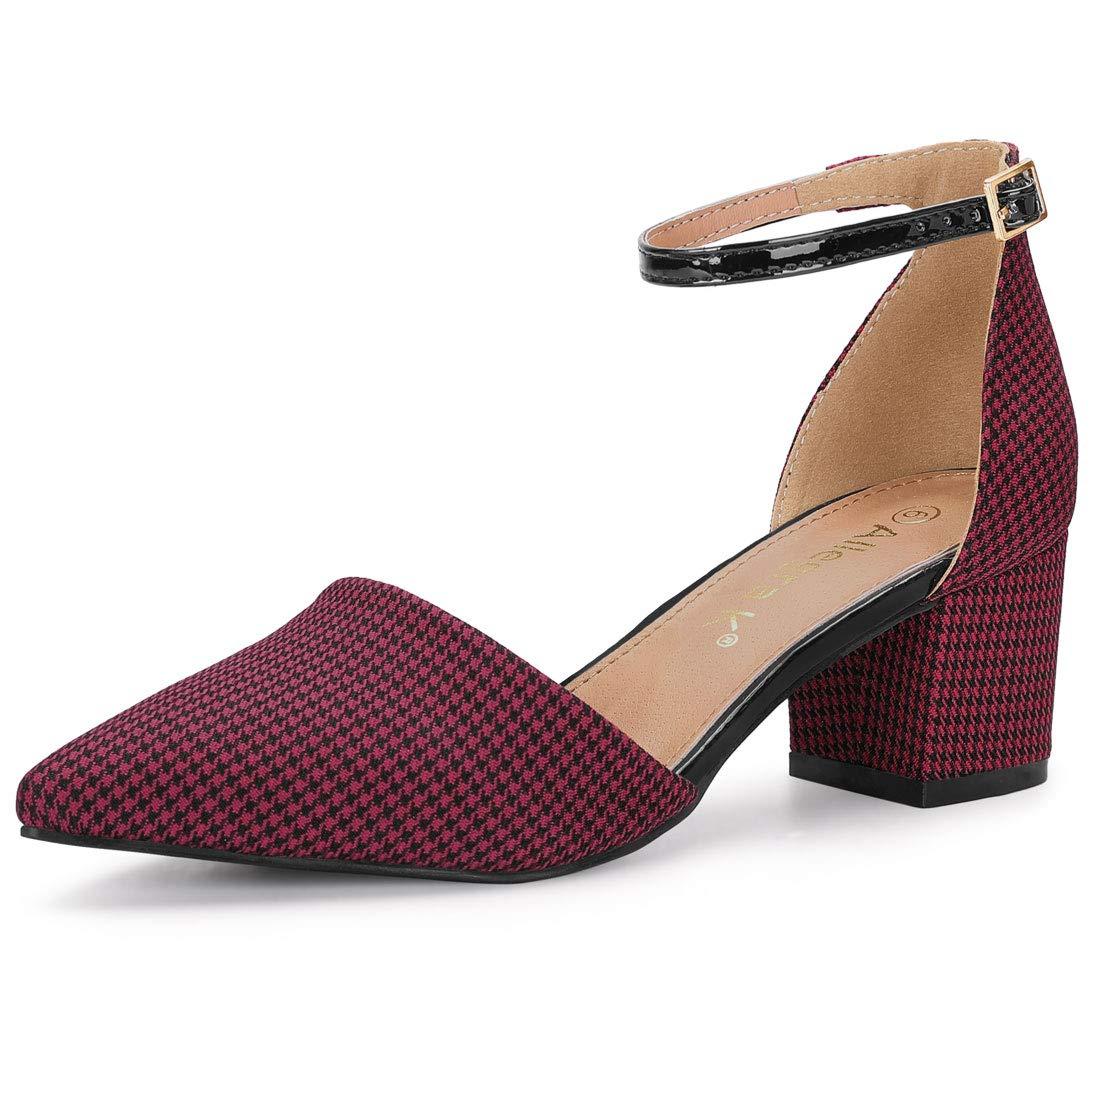 005e7774ff Amazon.com | Allegra K Women's Houndstooth Block Heel Ankle Strap Pumps |  Pumps